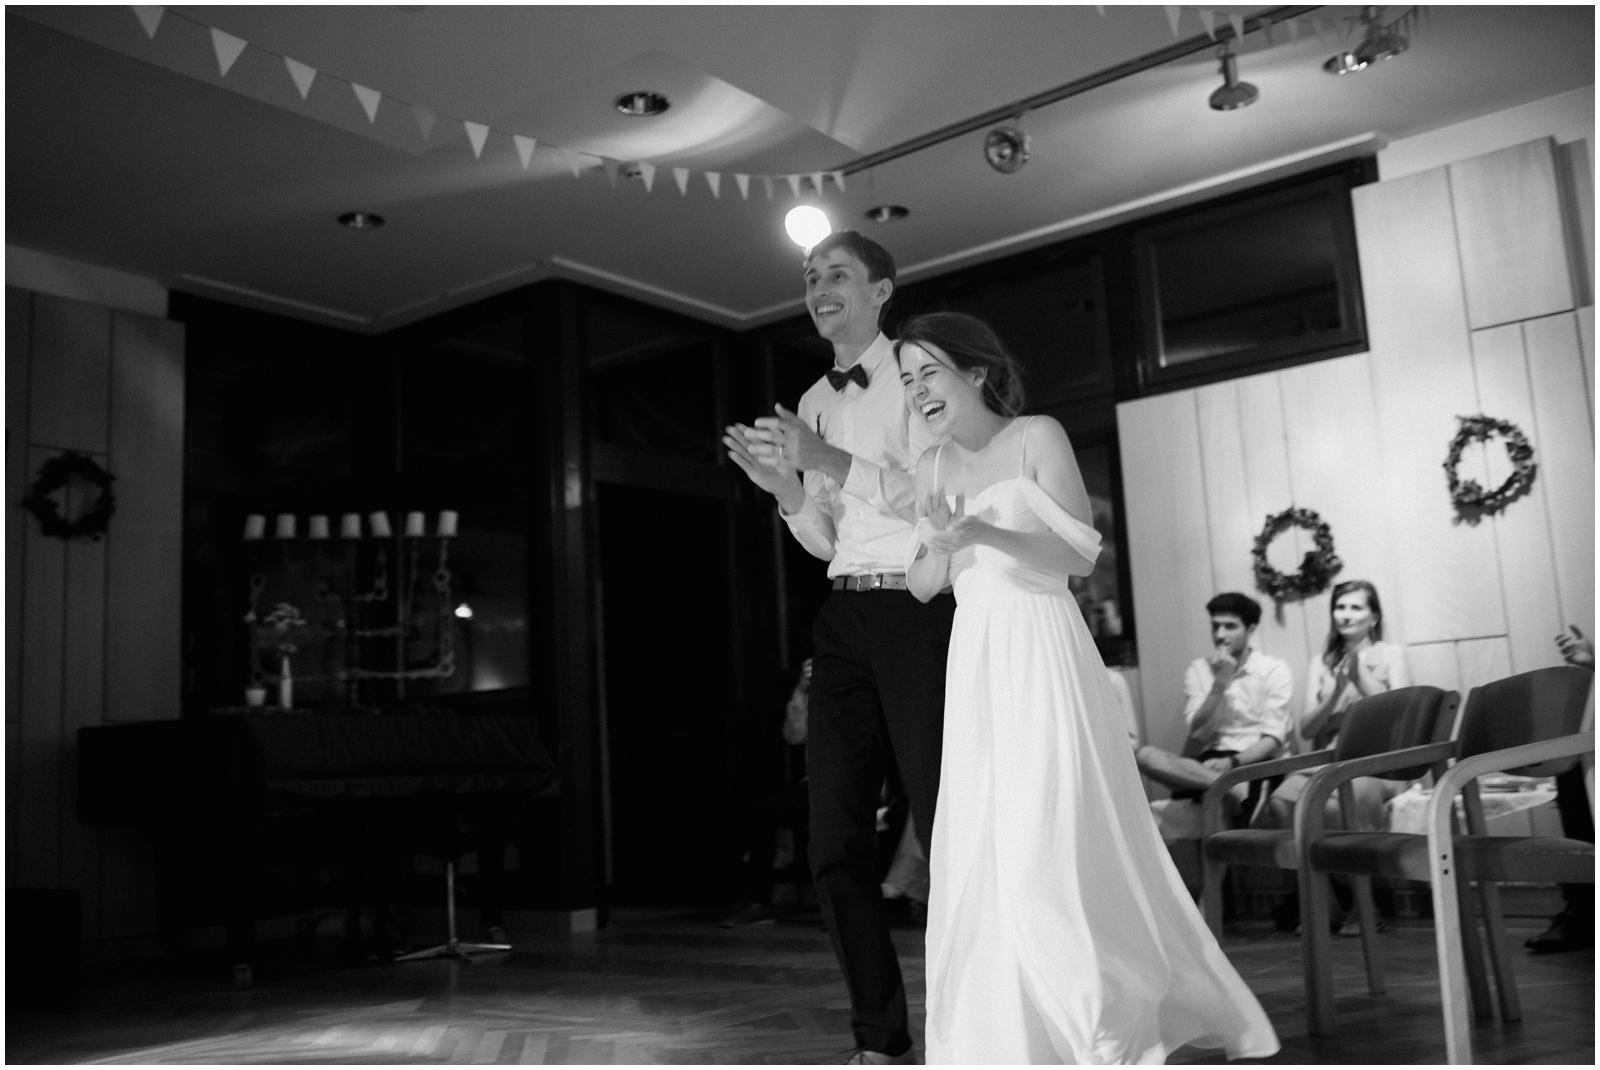 mirjam_thomas_wedding-674-2.jpg